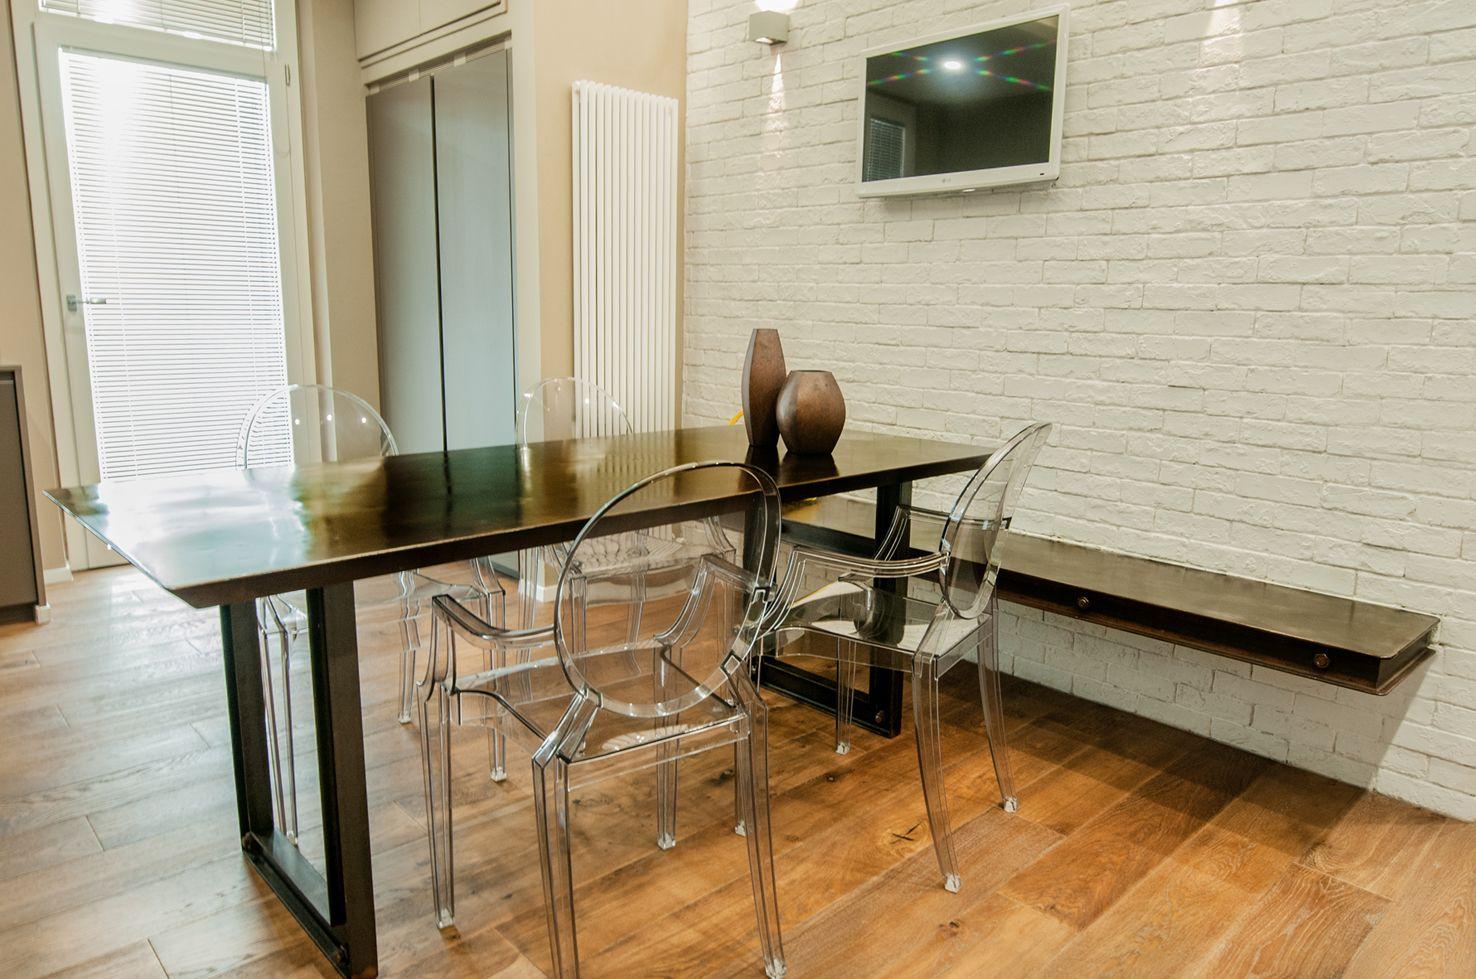 Tavolo e panca da cucina in acciaio corten | TAVOLI | Pinterest